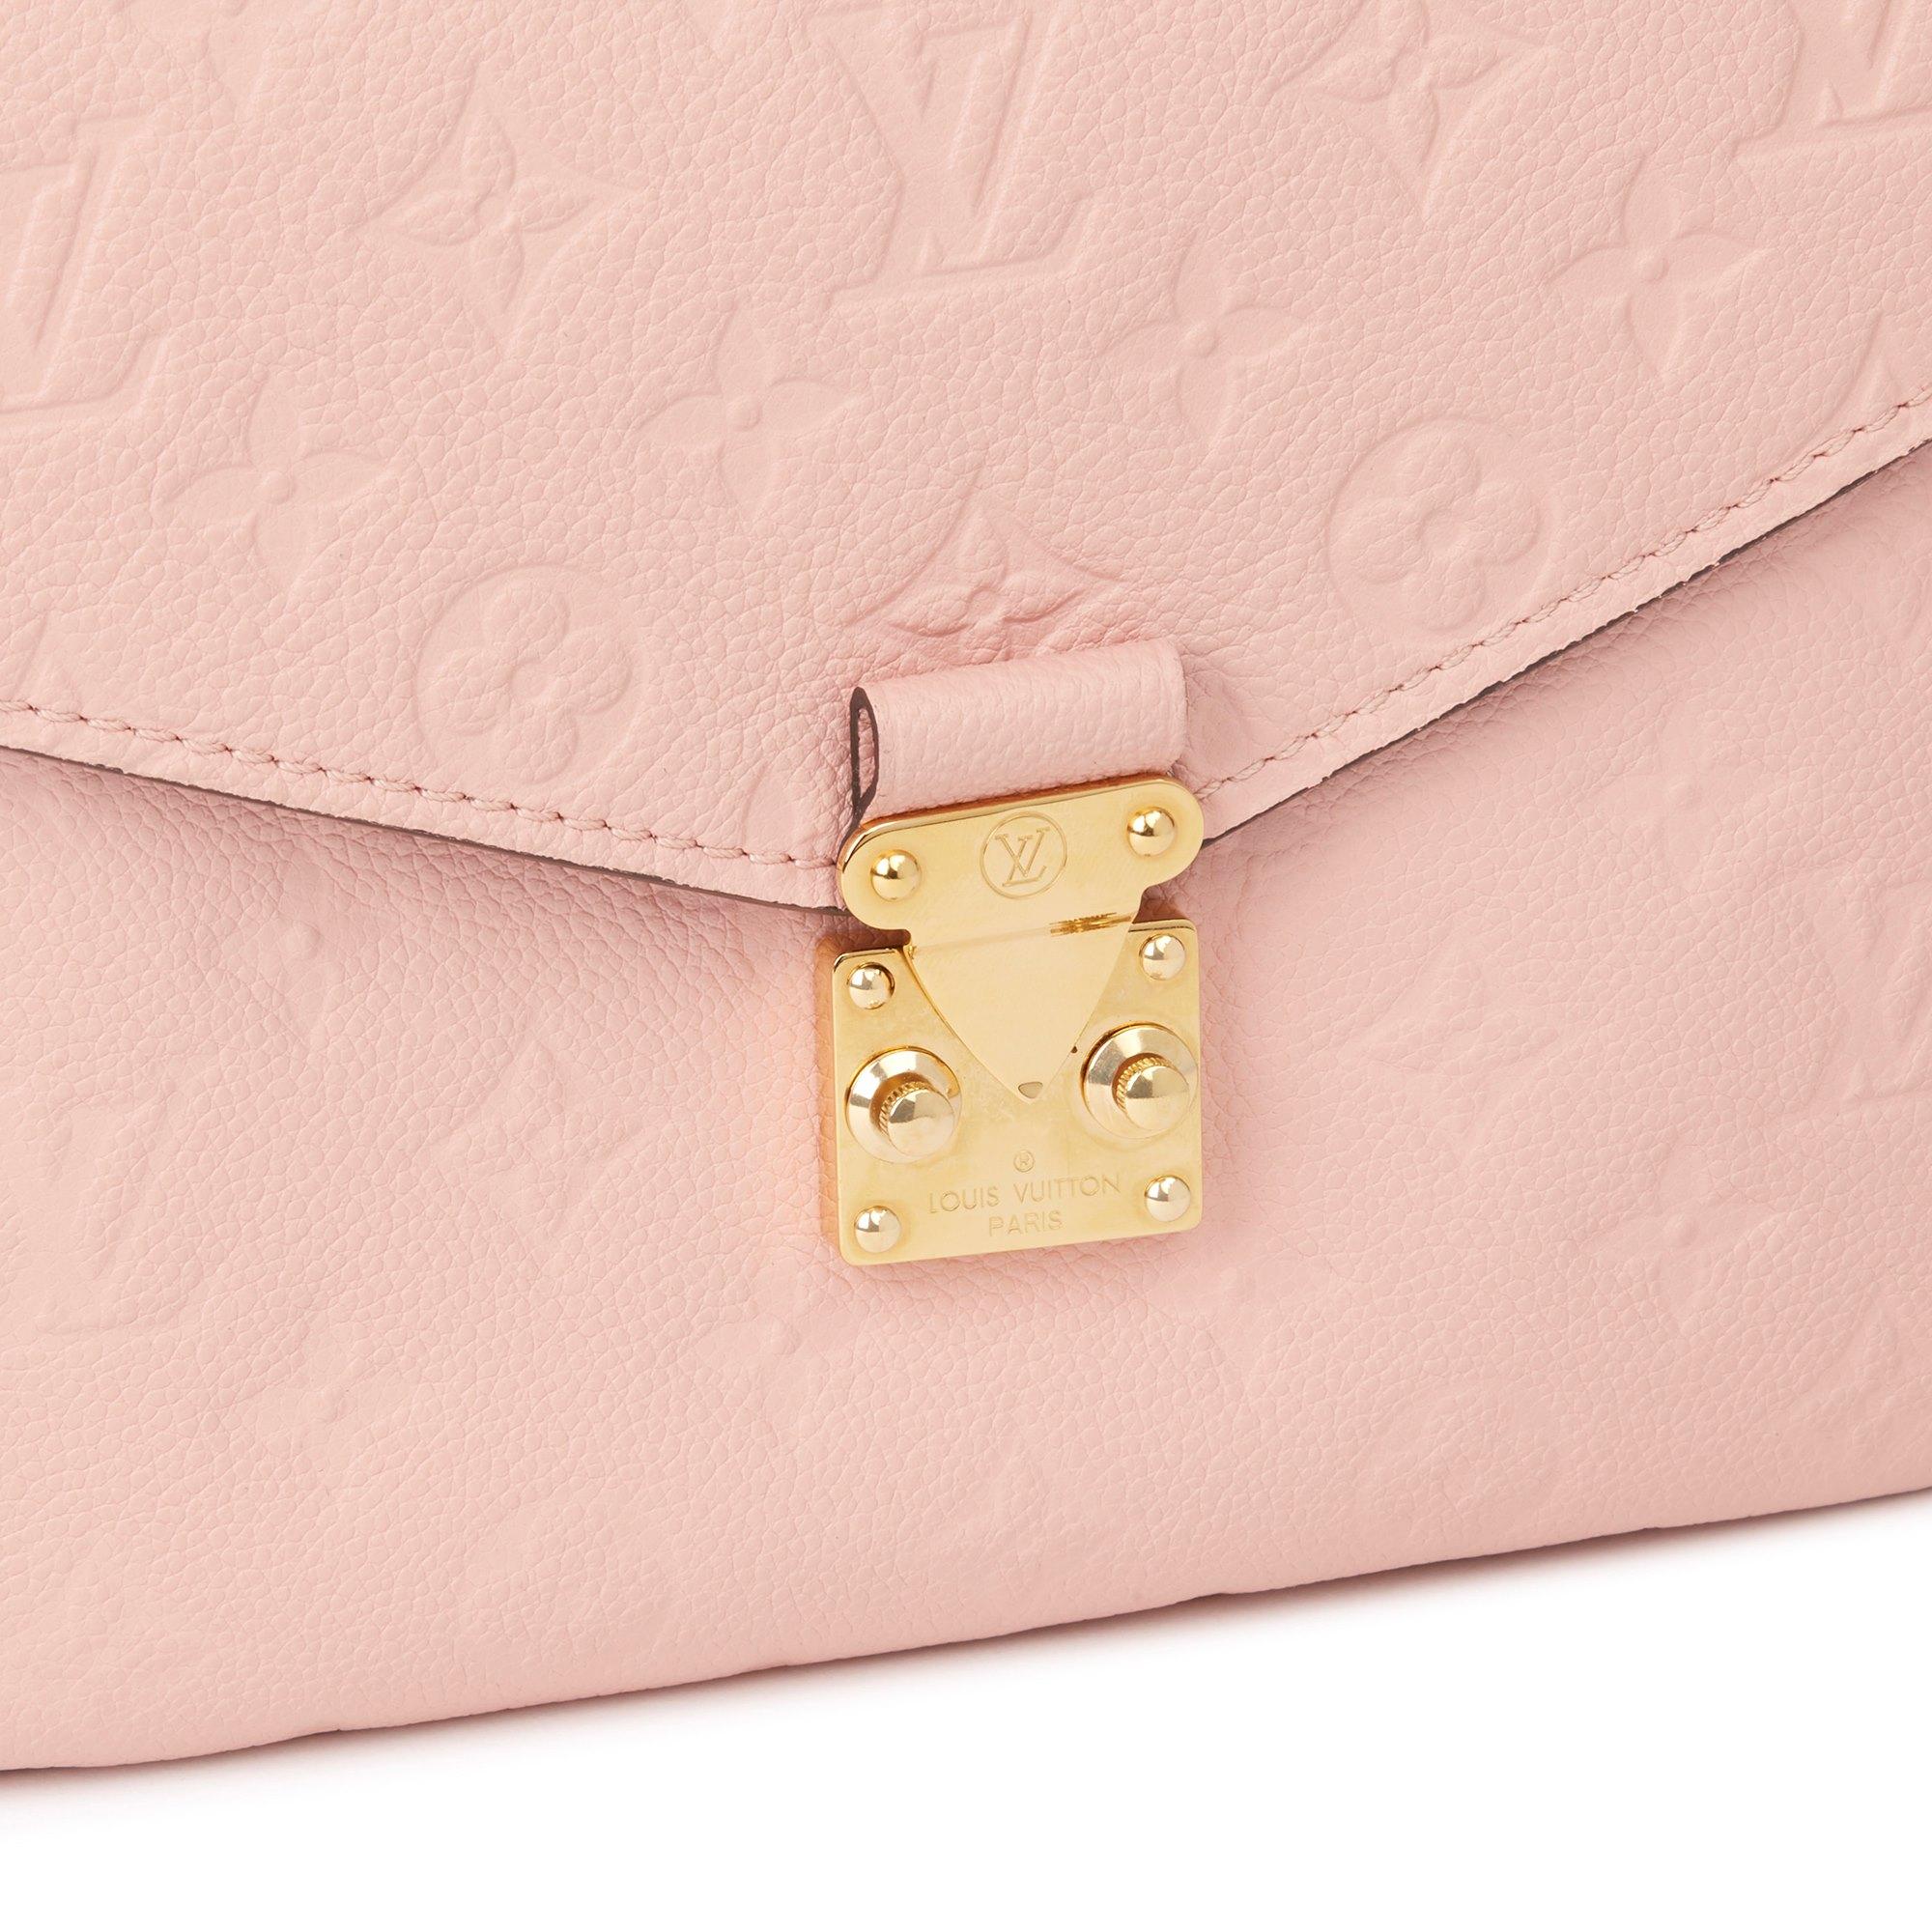 Louis Vuitton Rose Poudre Monogram Empreinte Leather Pochette Metis